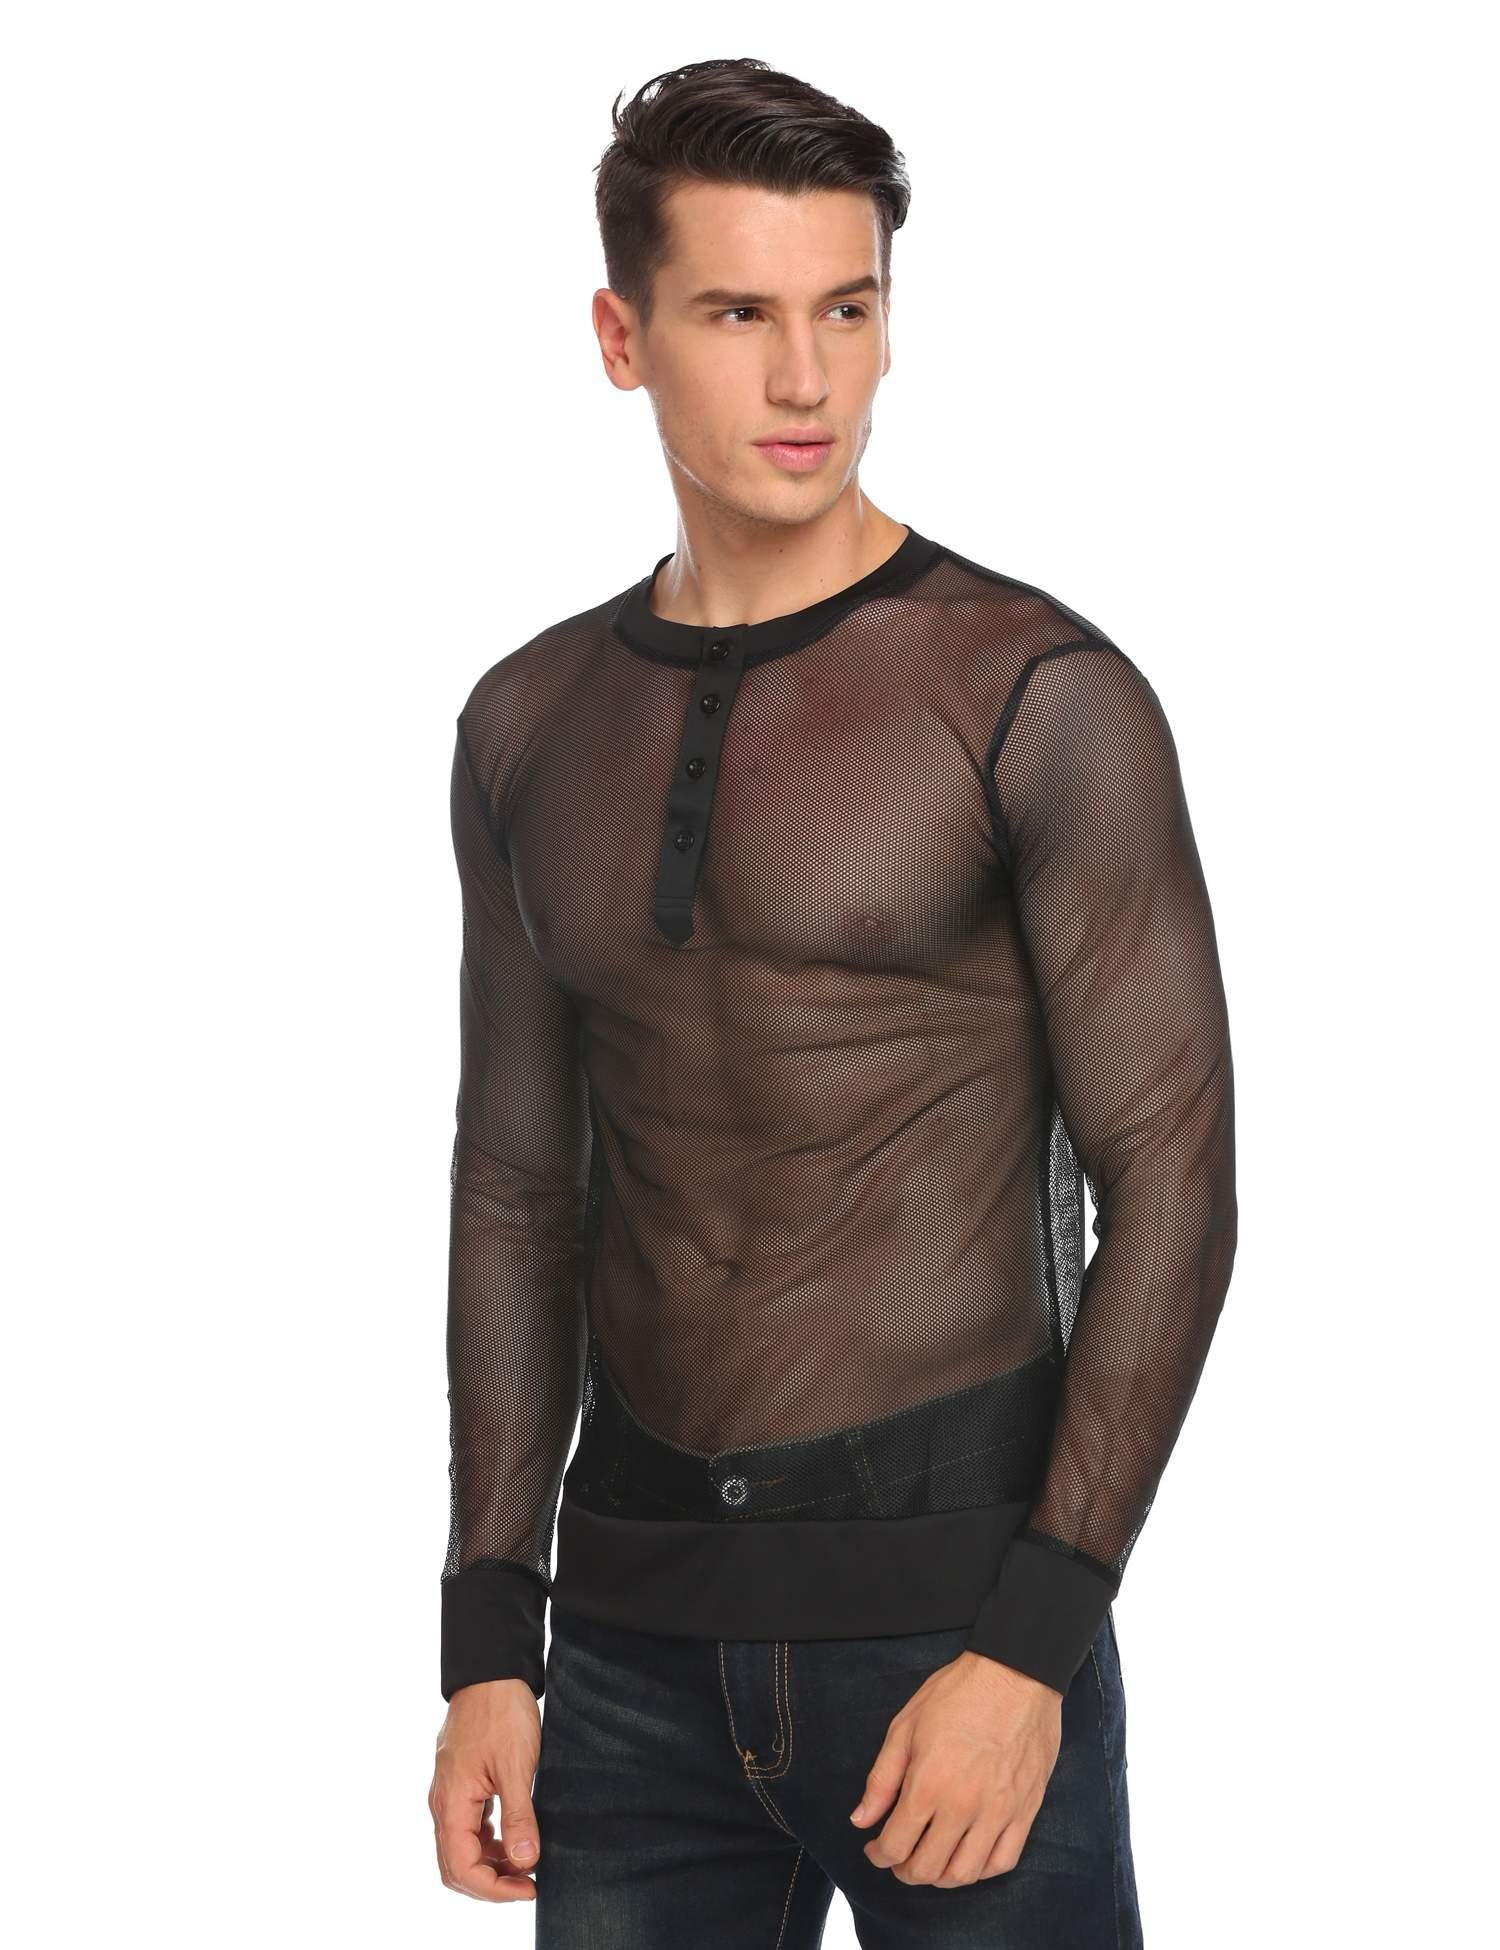 JINIDU Mens See Through Lace T-Shirts Long Sleeve Sexy Fashion Tees Tops (Small, Black2) by JINIDU